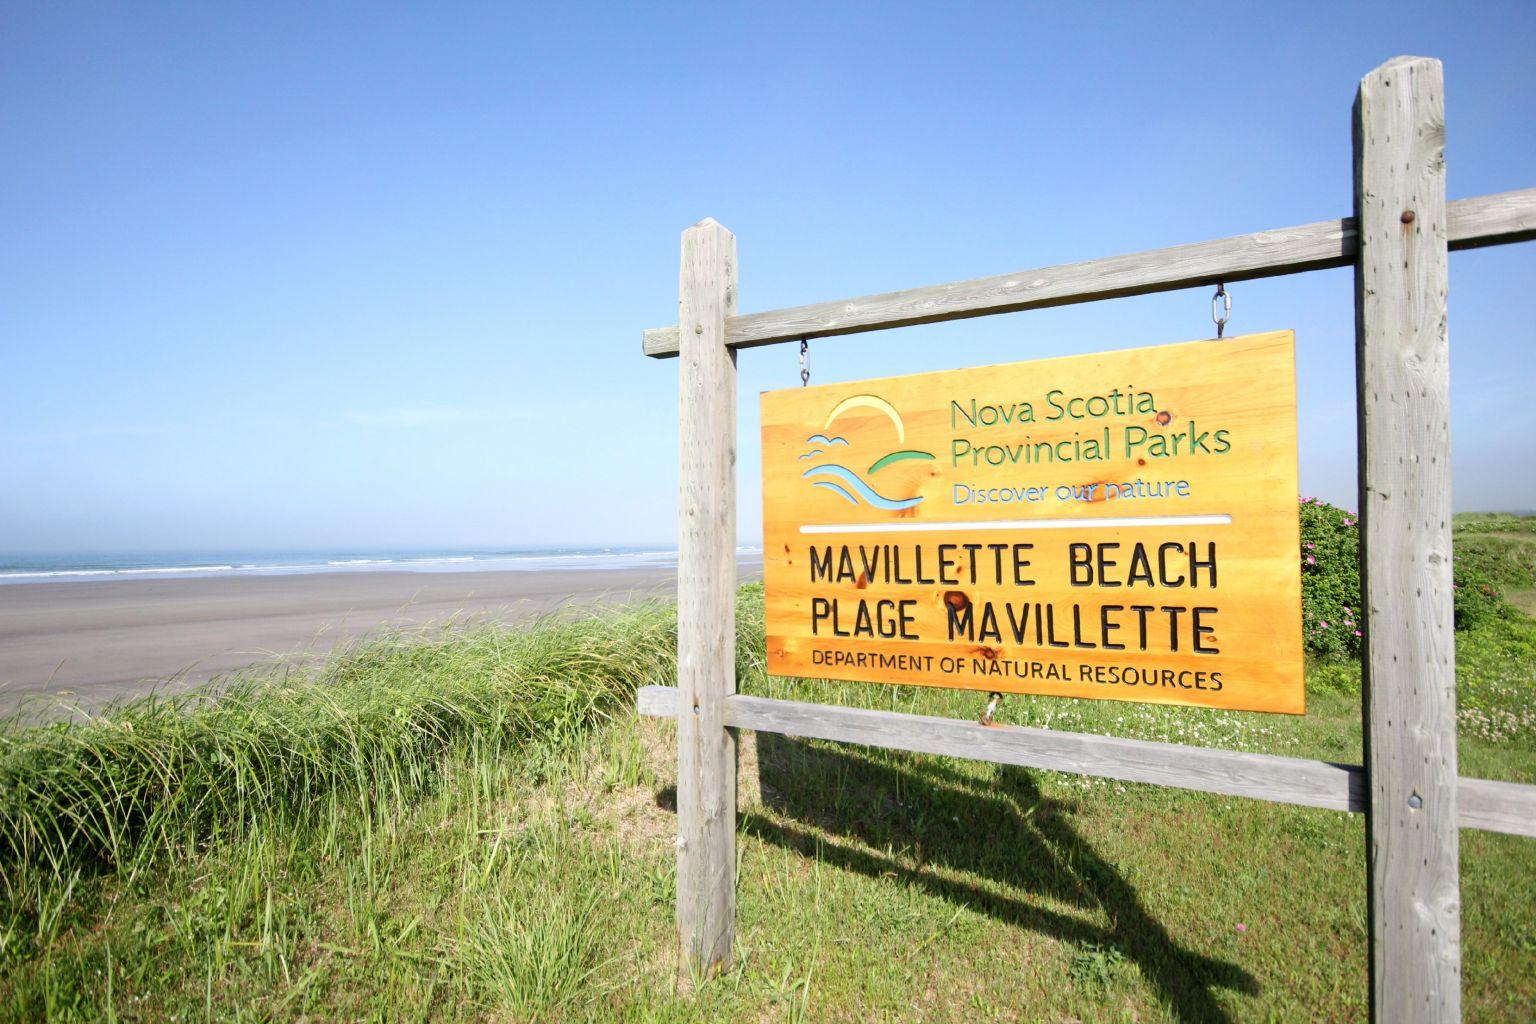 Mavillette Beach Restaurant